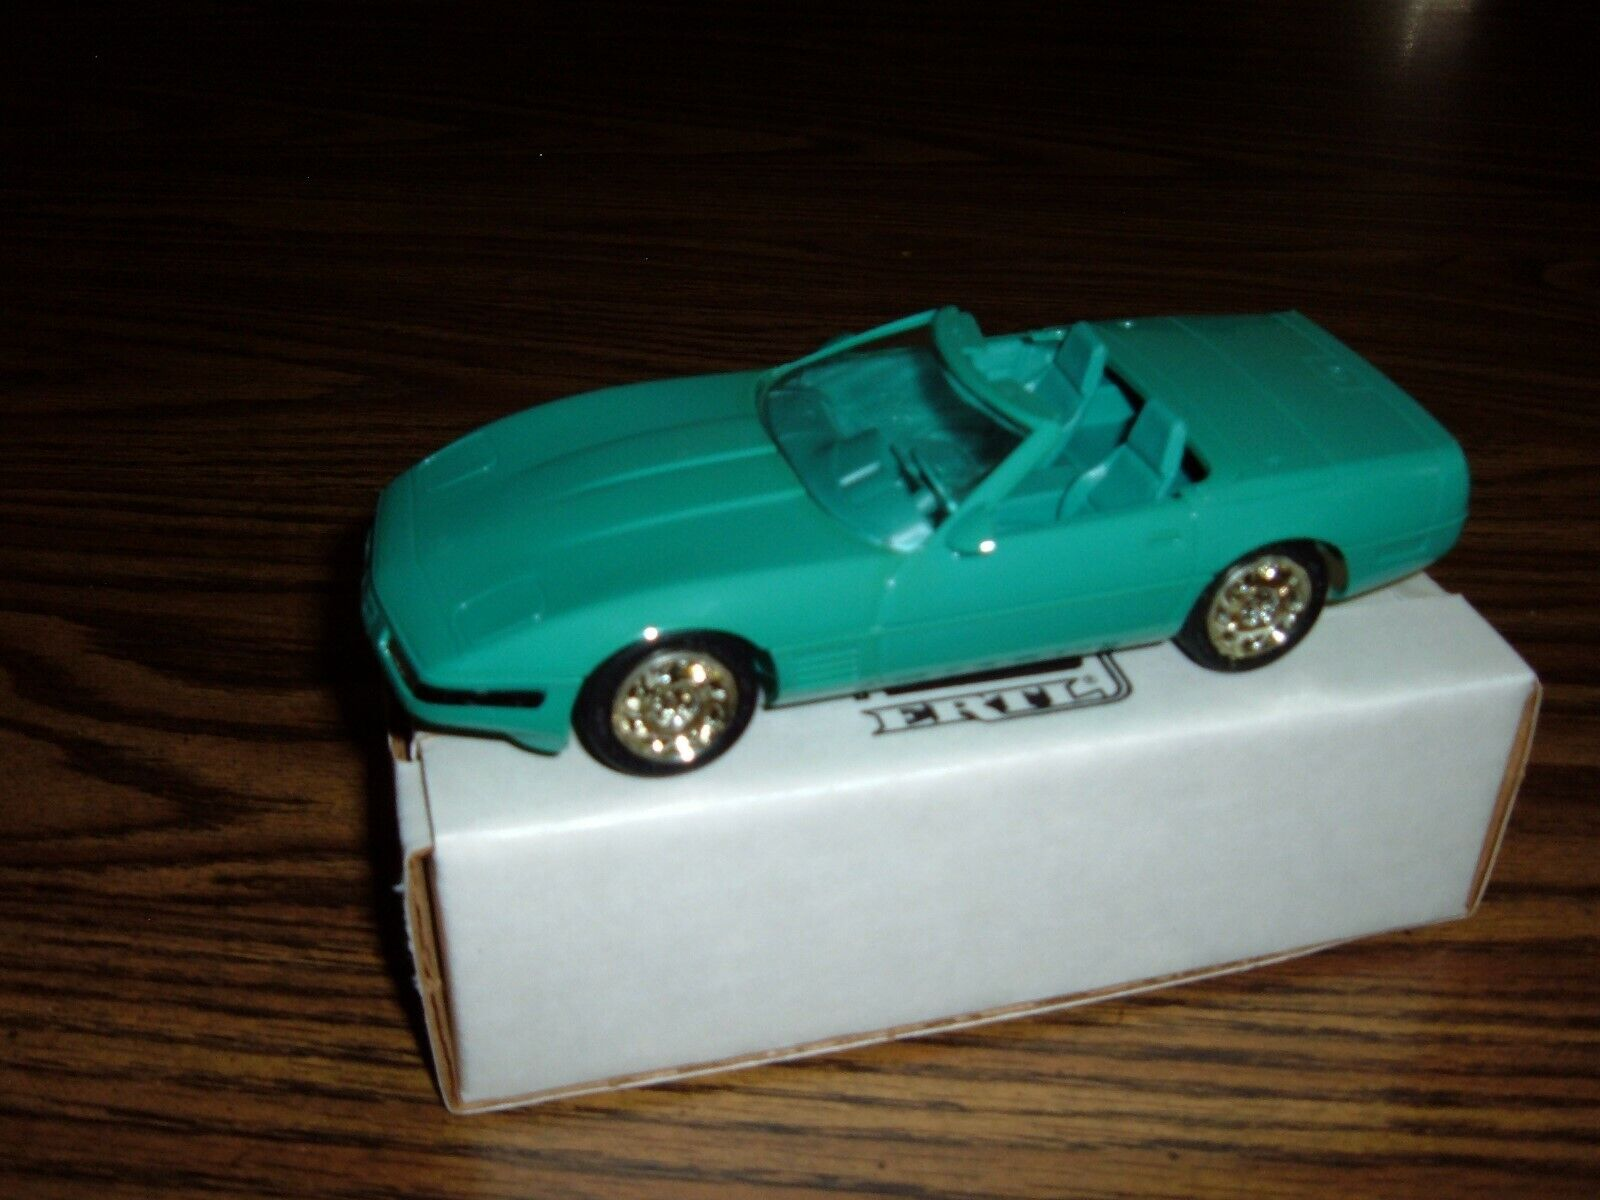 1991 Chevrolet Corvette Convertible Turquoise Metallic AMT